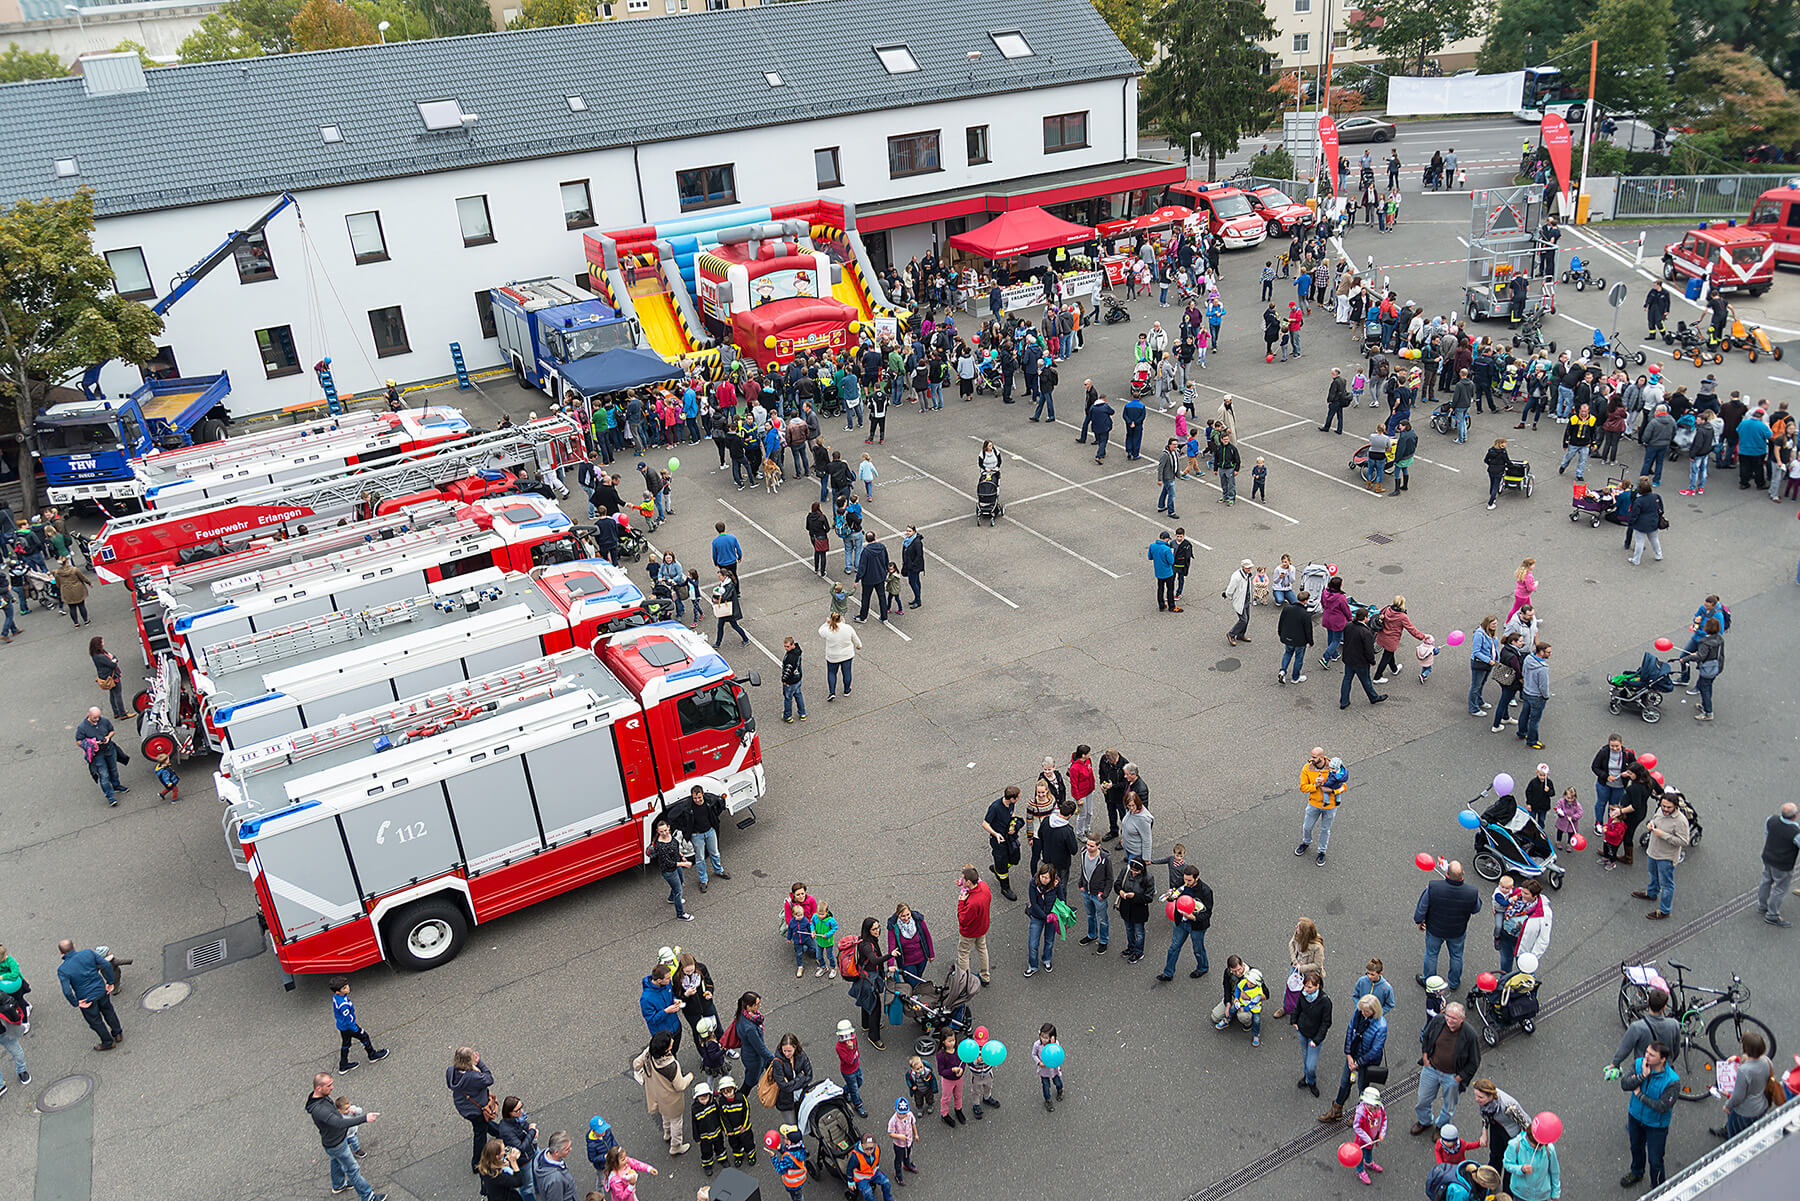 Feuerwehr Erlangen - Tag der offenen Tür 2017 - gokart-profi.de Kettcar Verleih